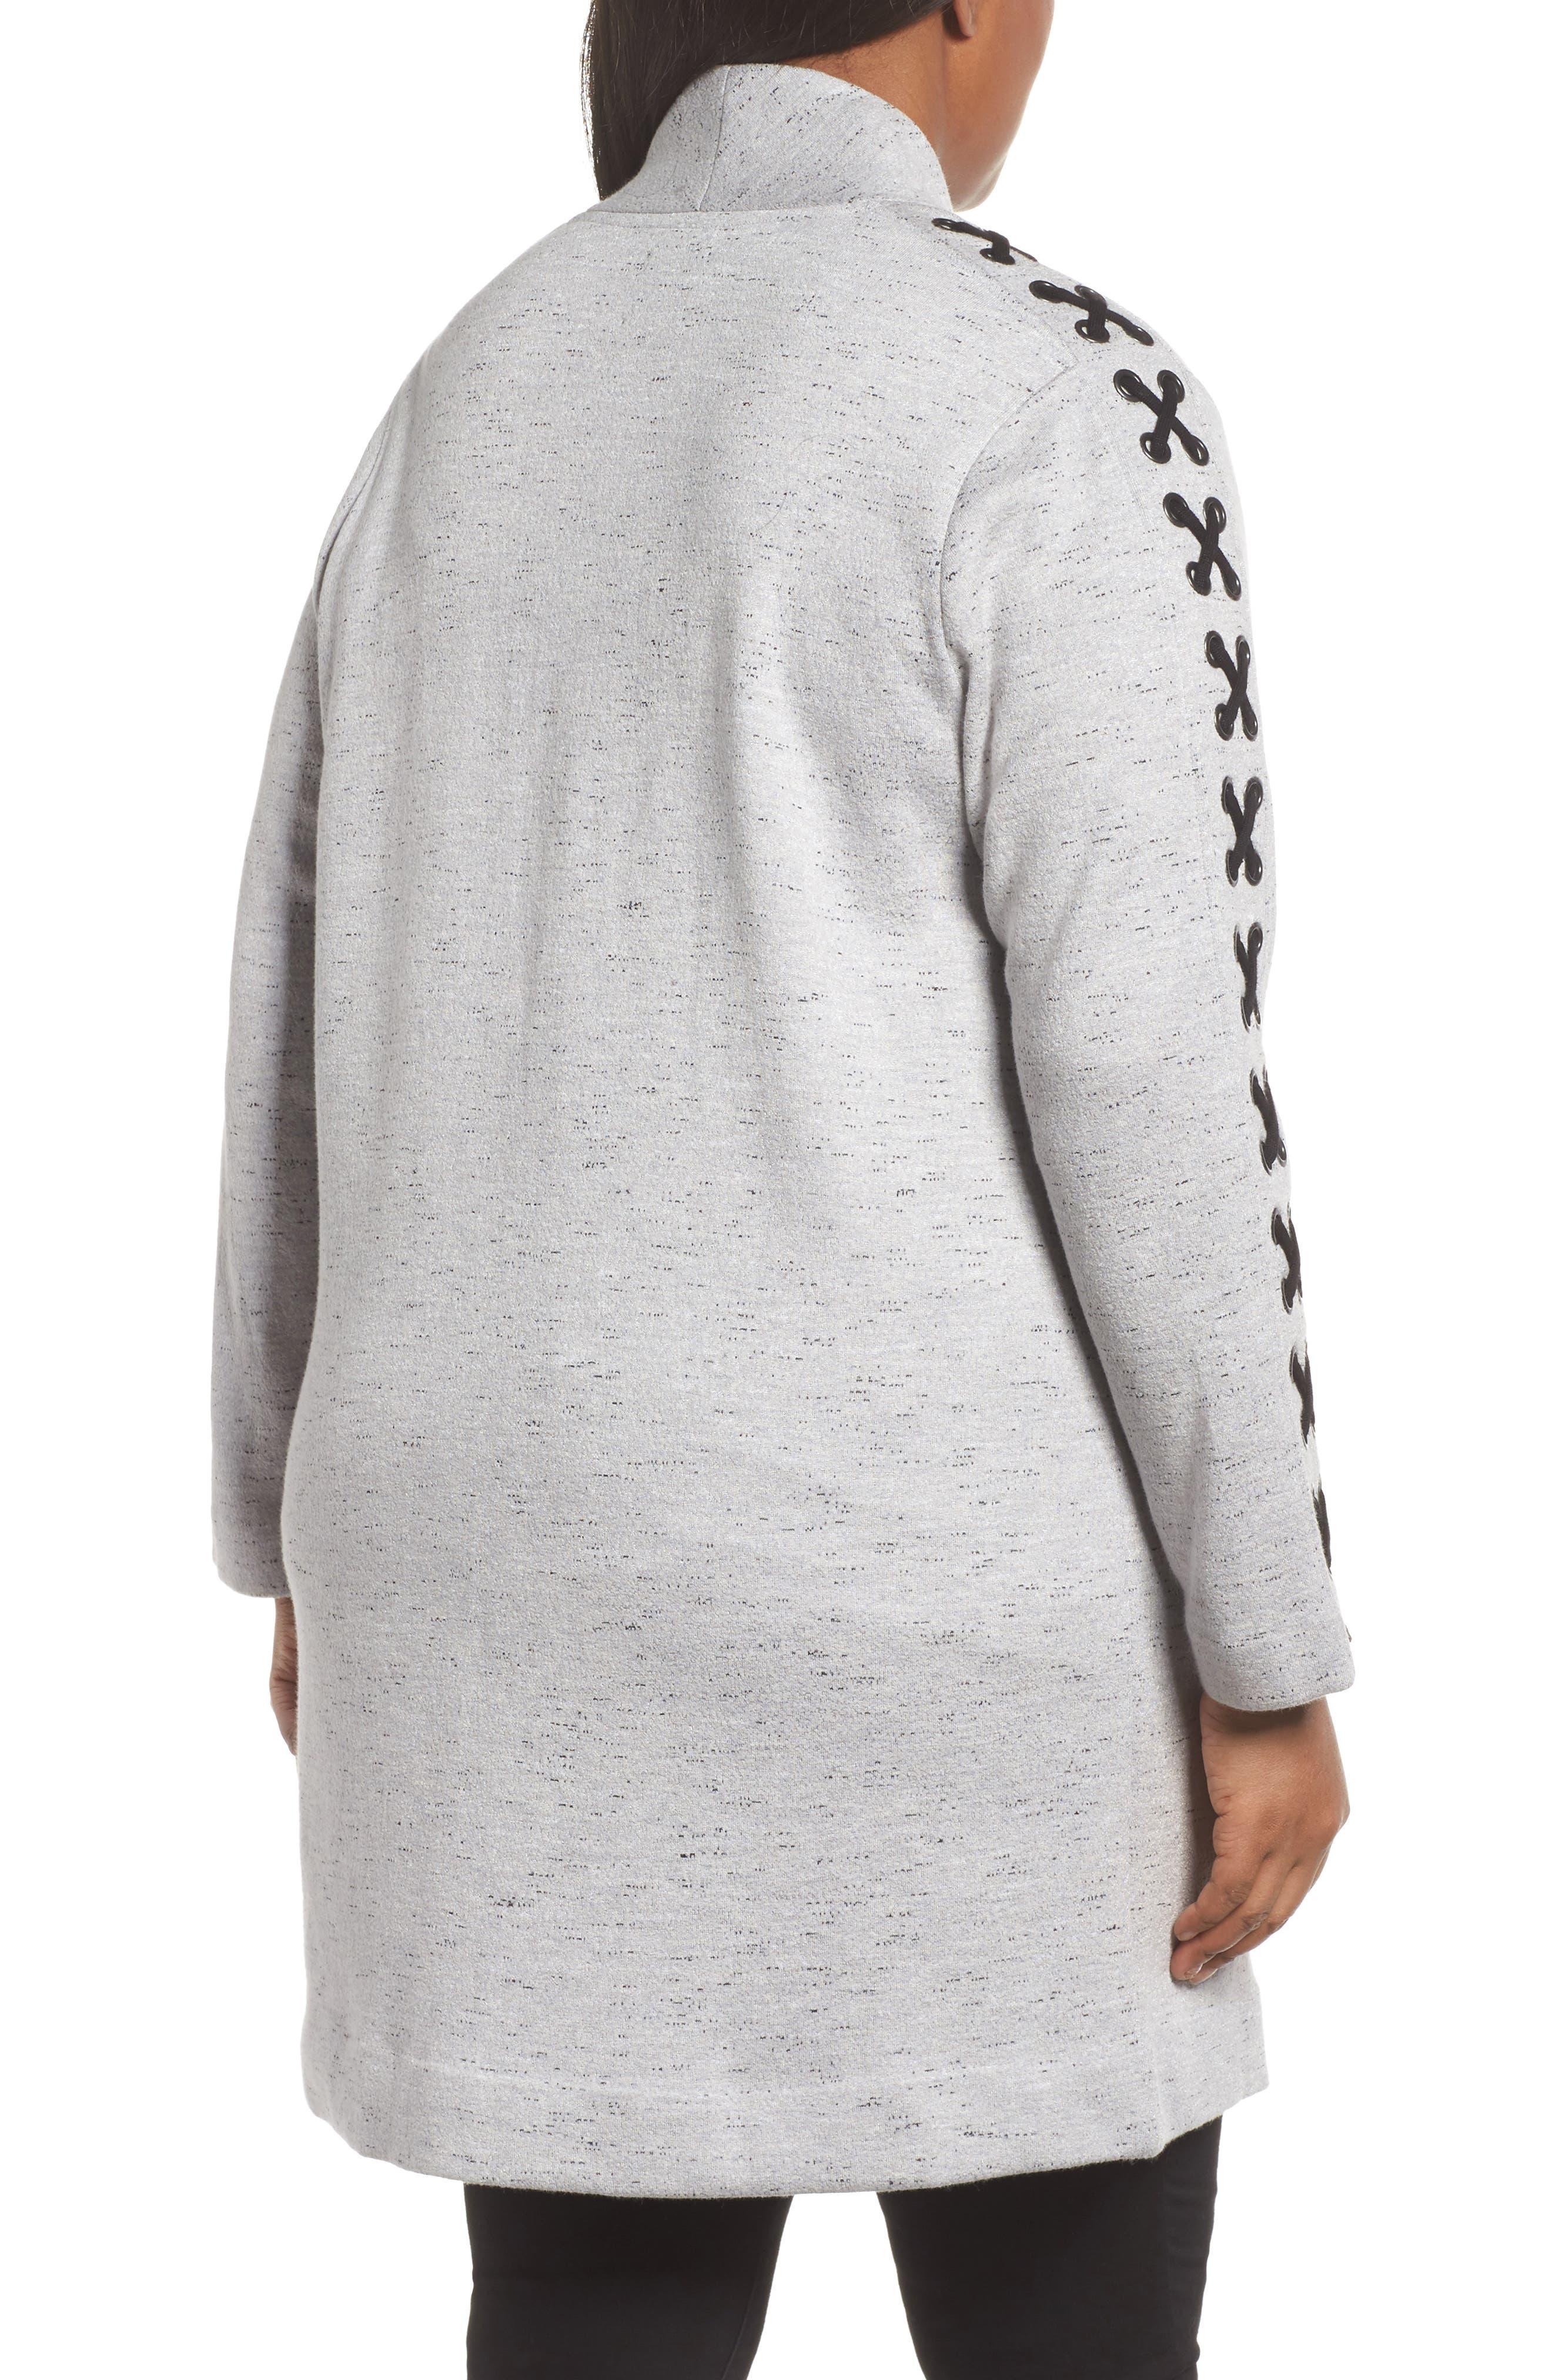 Crisscross Detail Knit Jacket,                             Alternate thumbnail 2, color,                             Granite